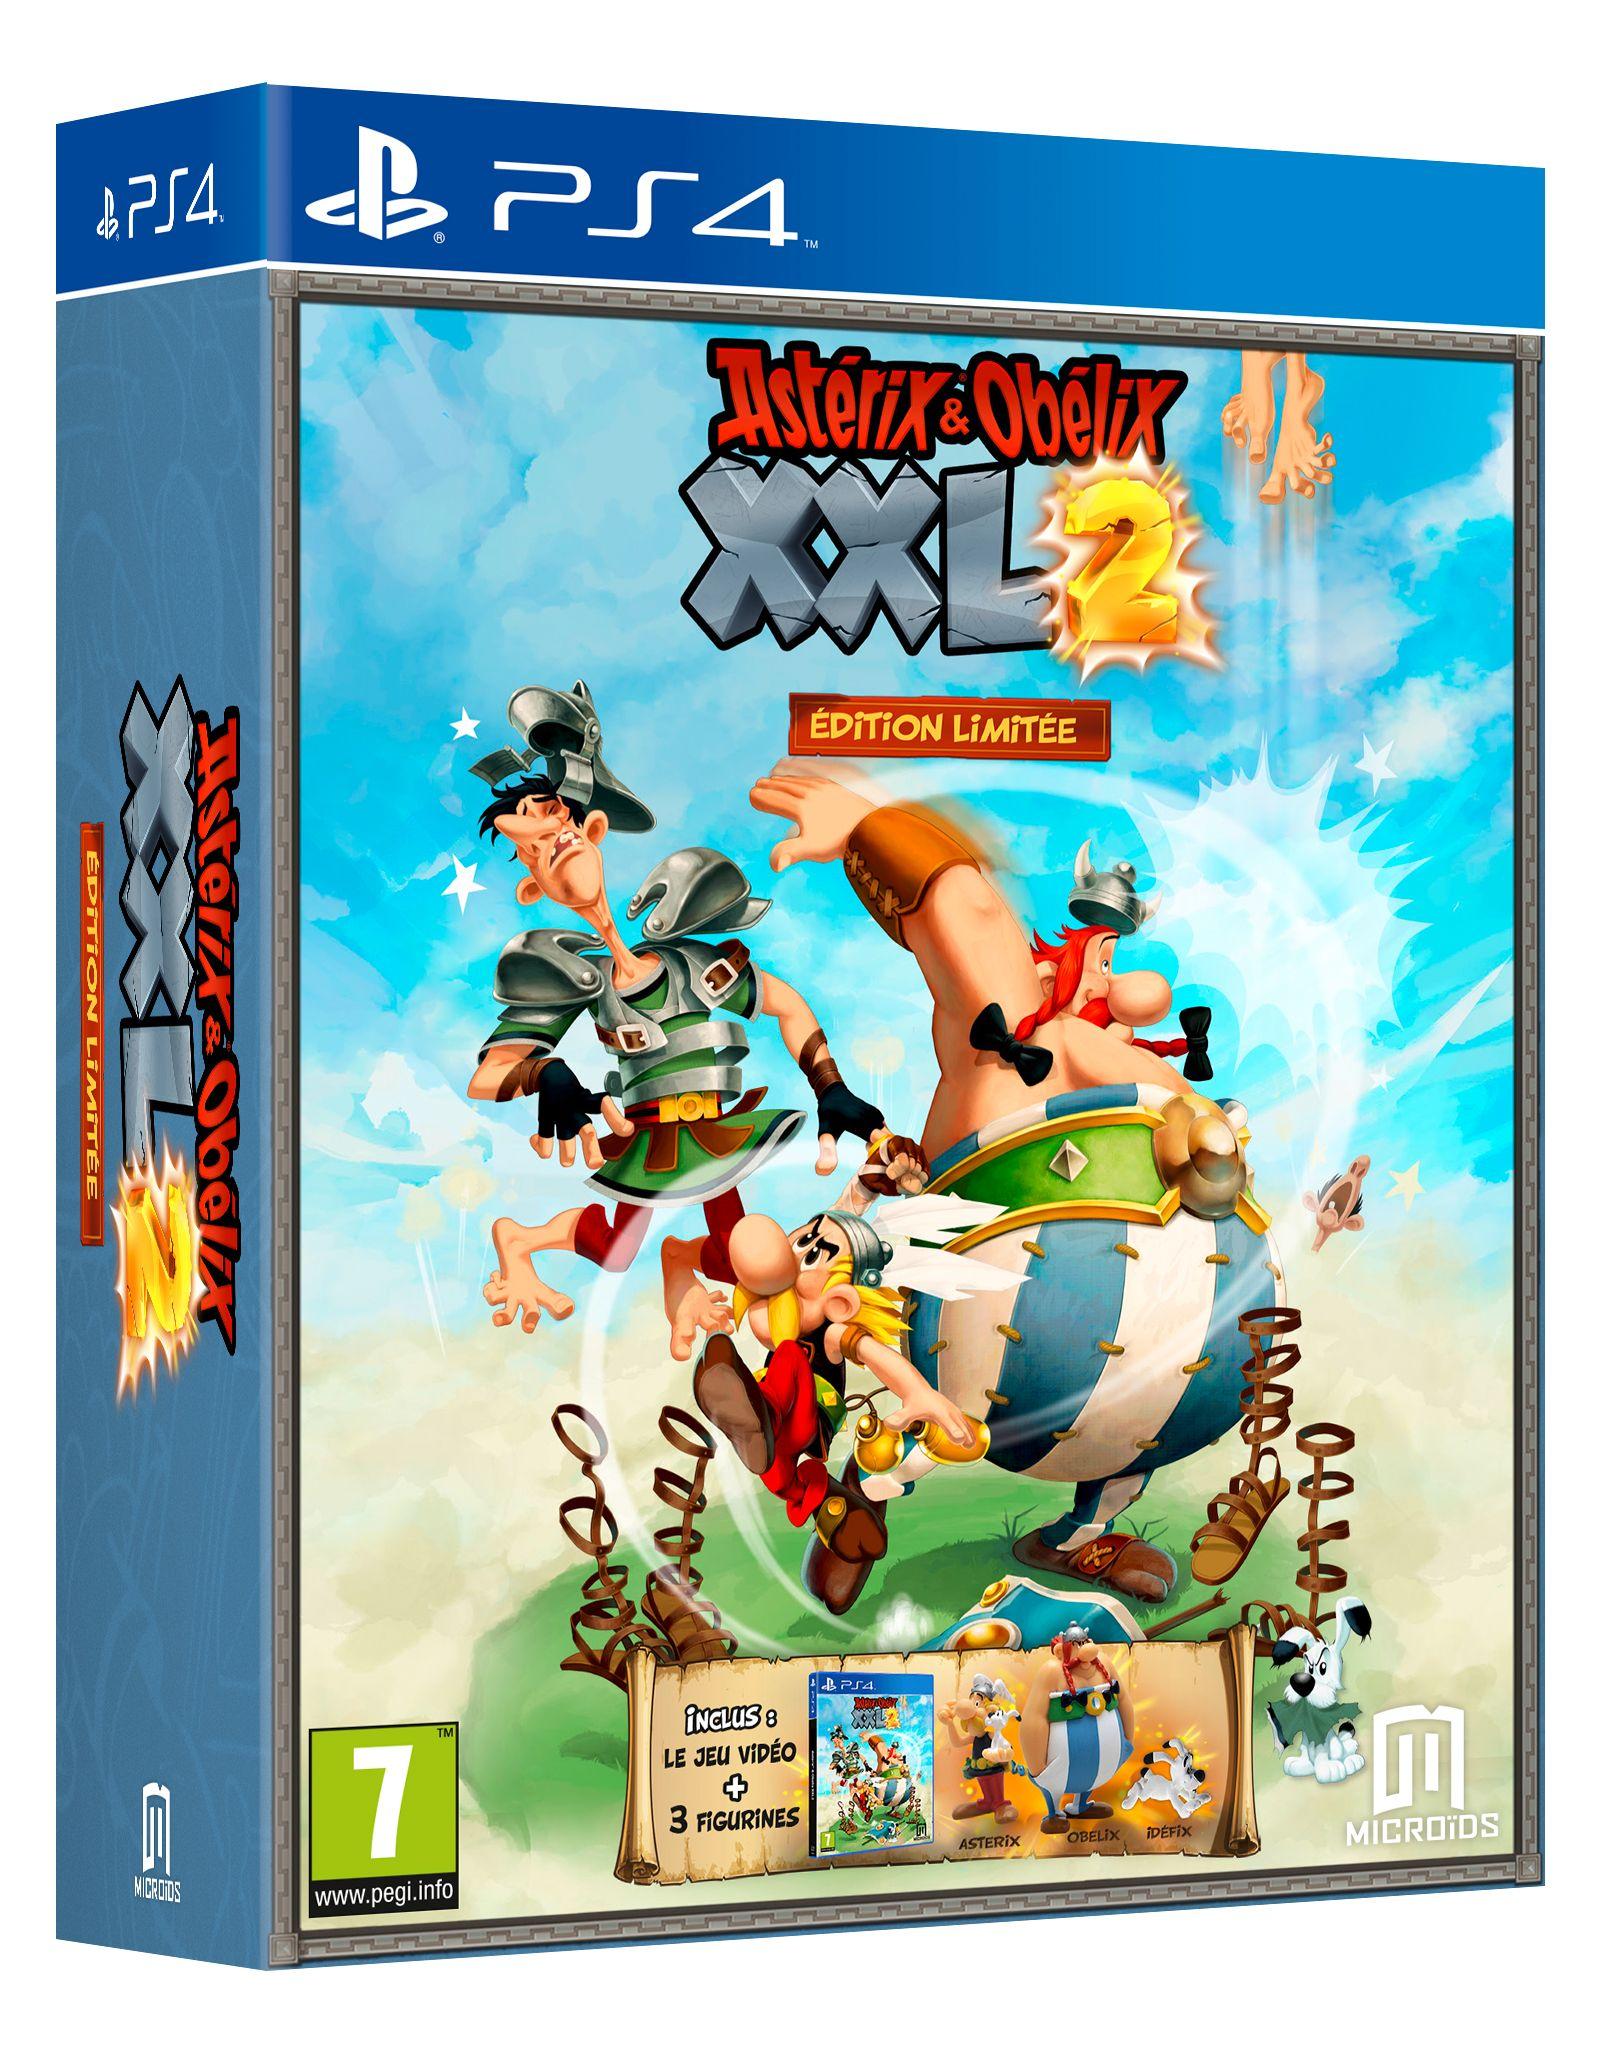 Asterix et Obelix XXL2